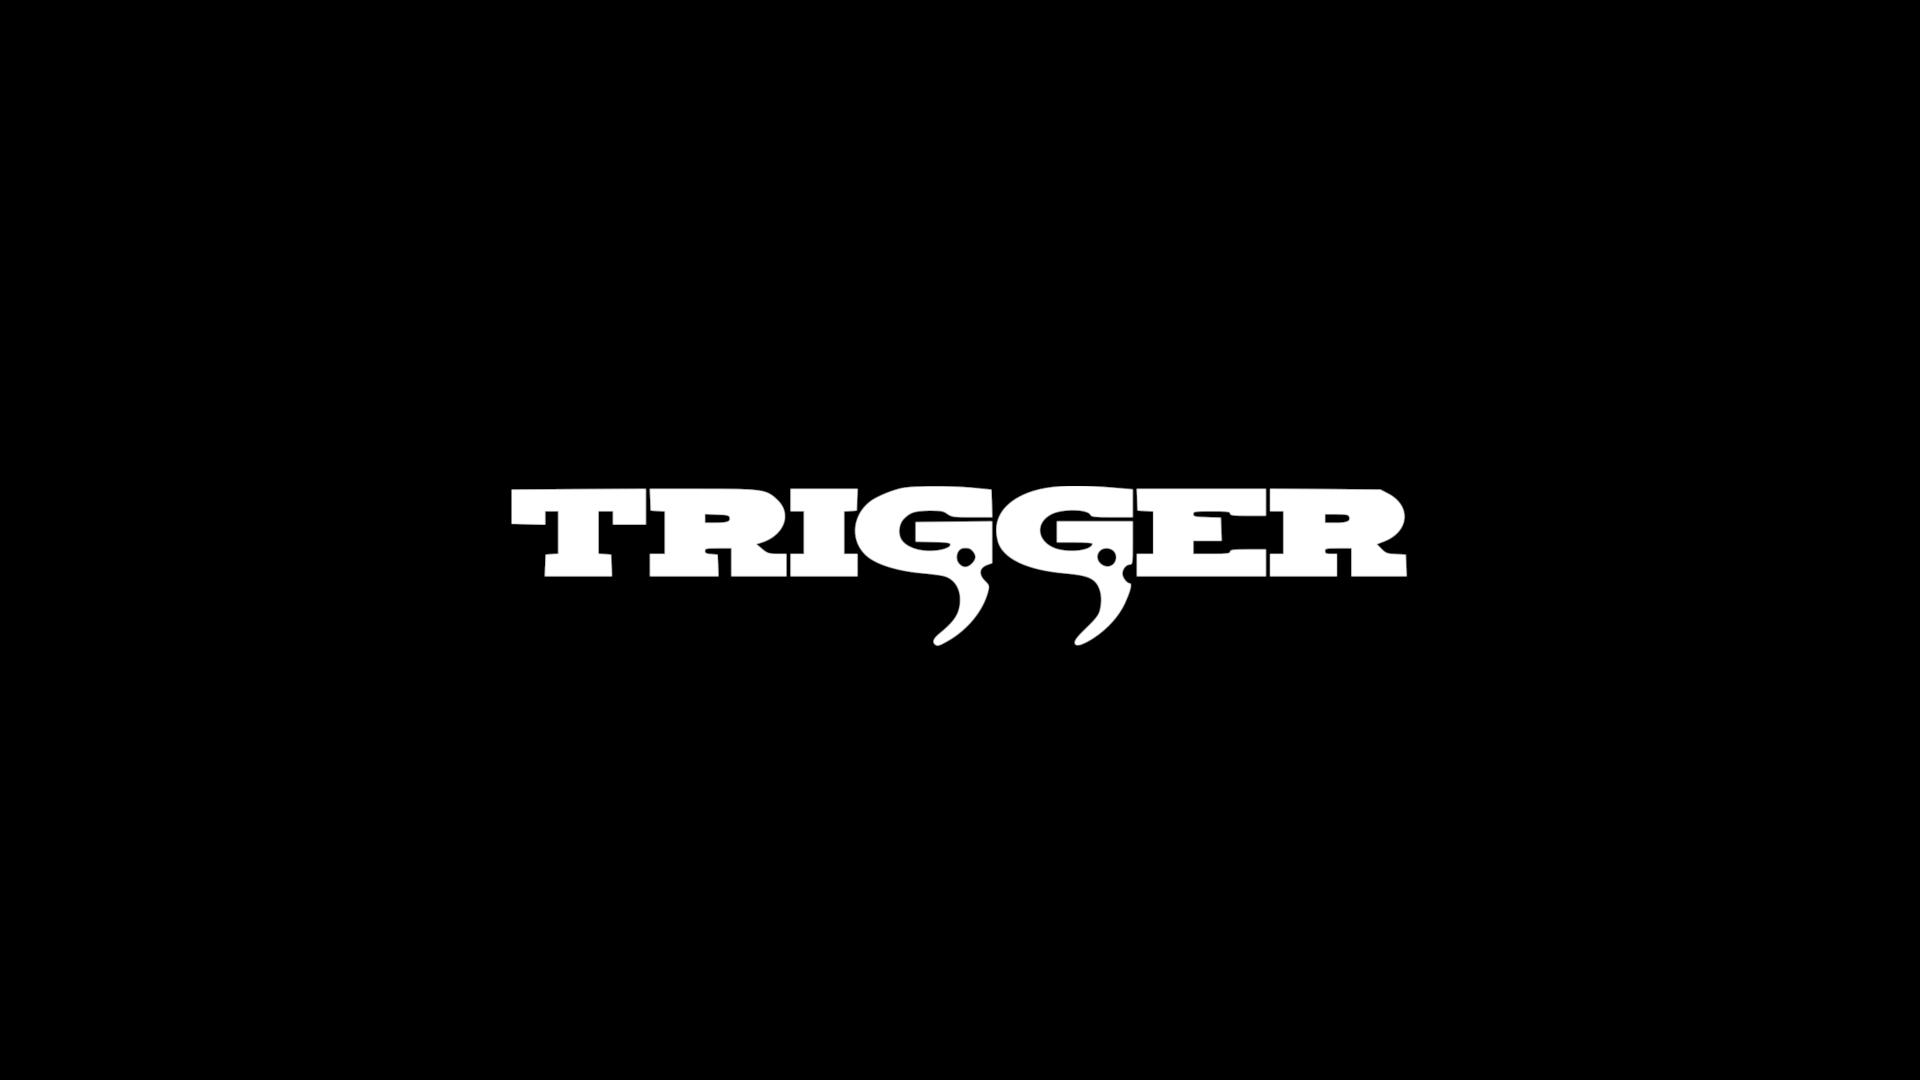 Studio Trigger Know Your Meme